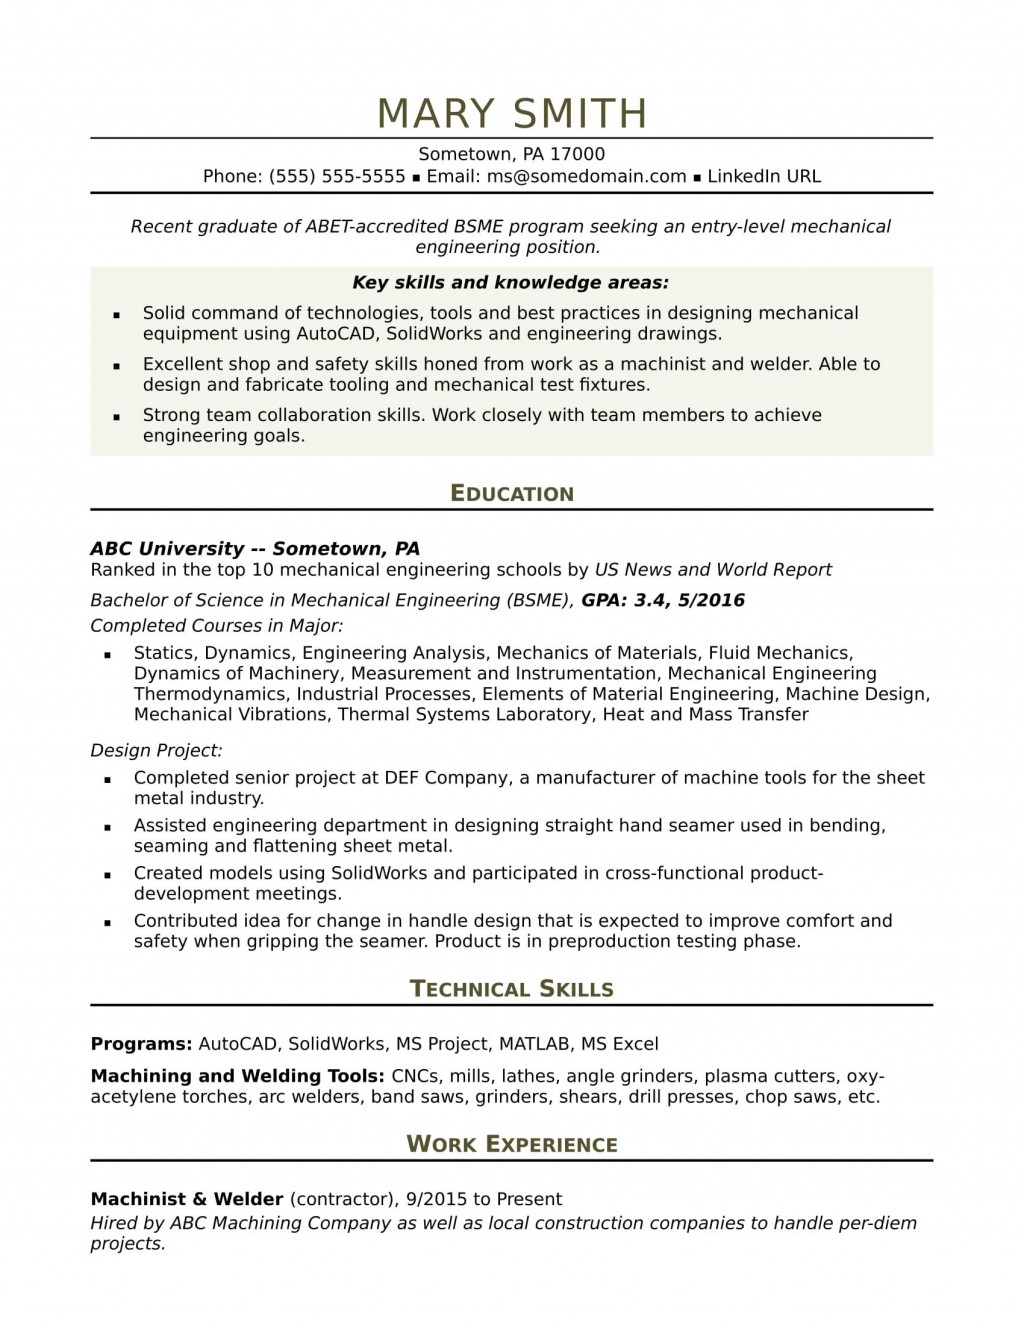 recent graduate resume template  addictionary